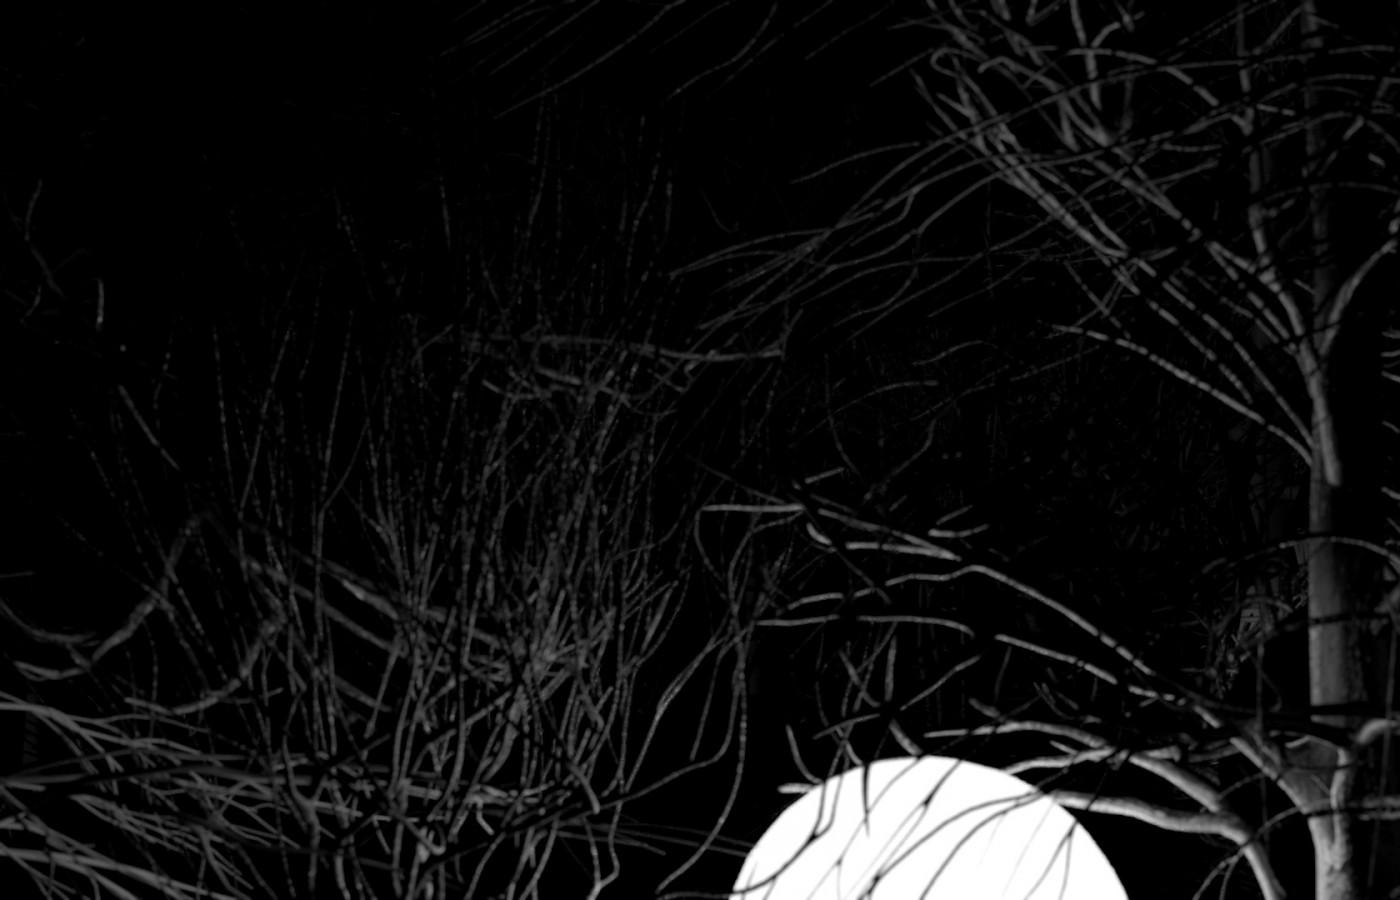 img-Lost_Moon-300dpi-1